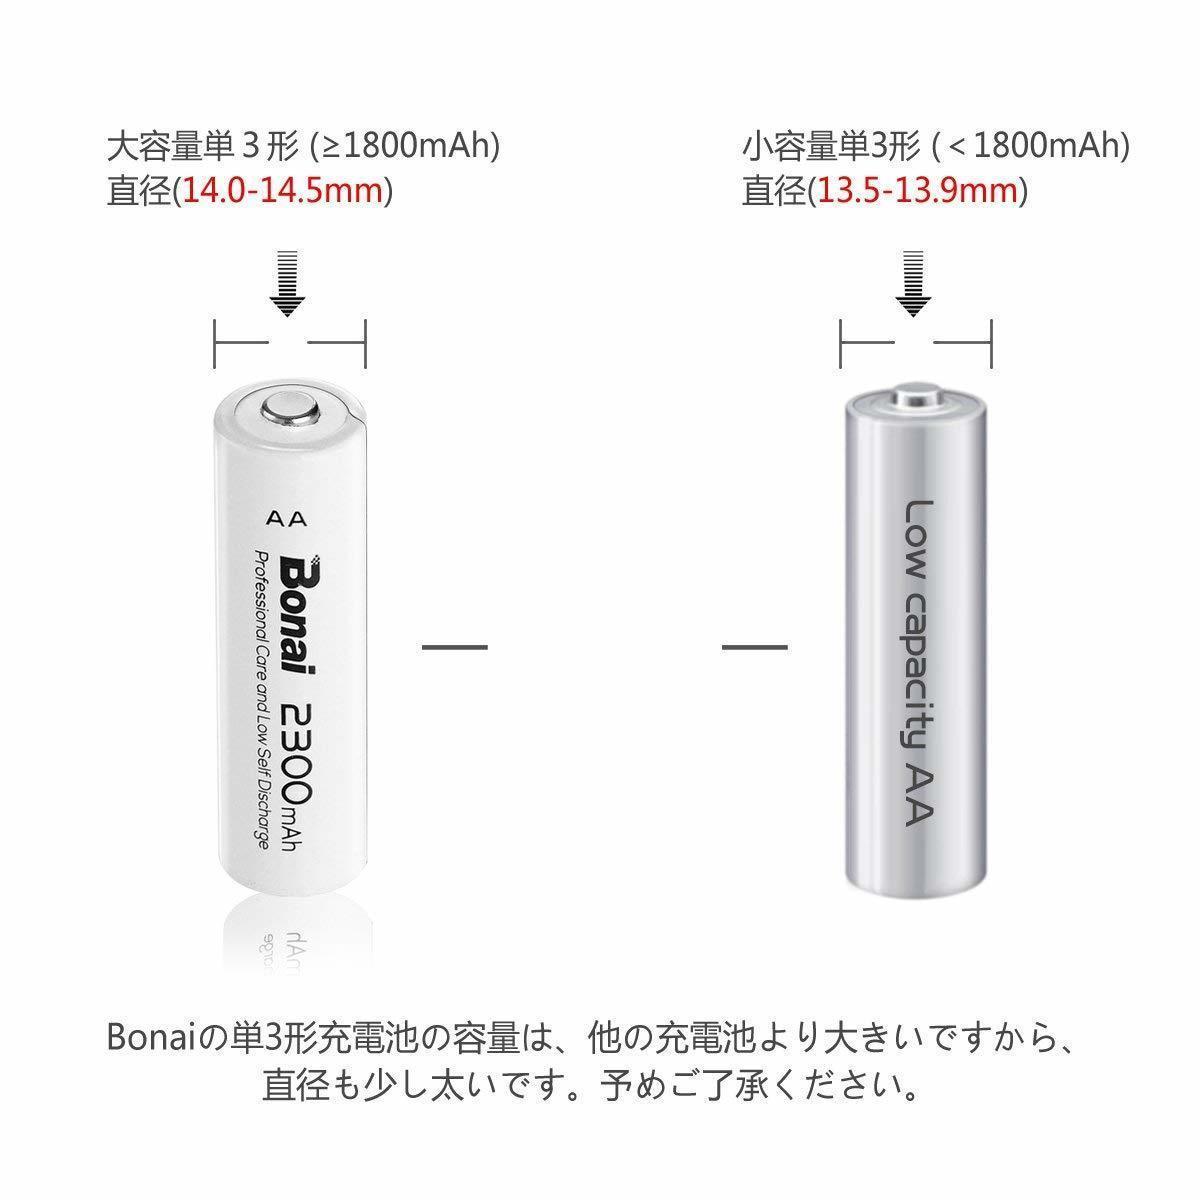 [新品/送料無料] Bonai 単3形 充電池 充電式ニッケル水素電池 24個パック PSE/CE取得 UL認証済み(高容量2300mAh 約1200回使用可能)_画像5